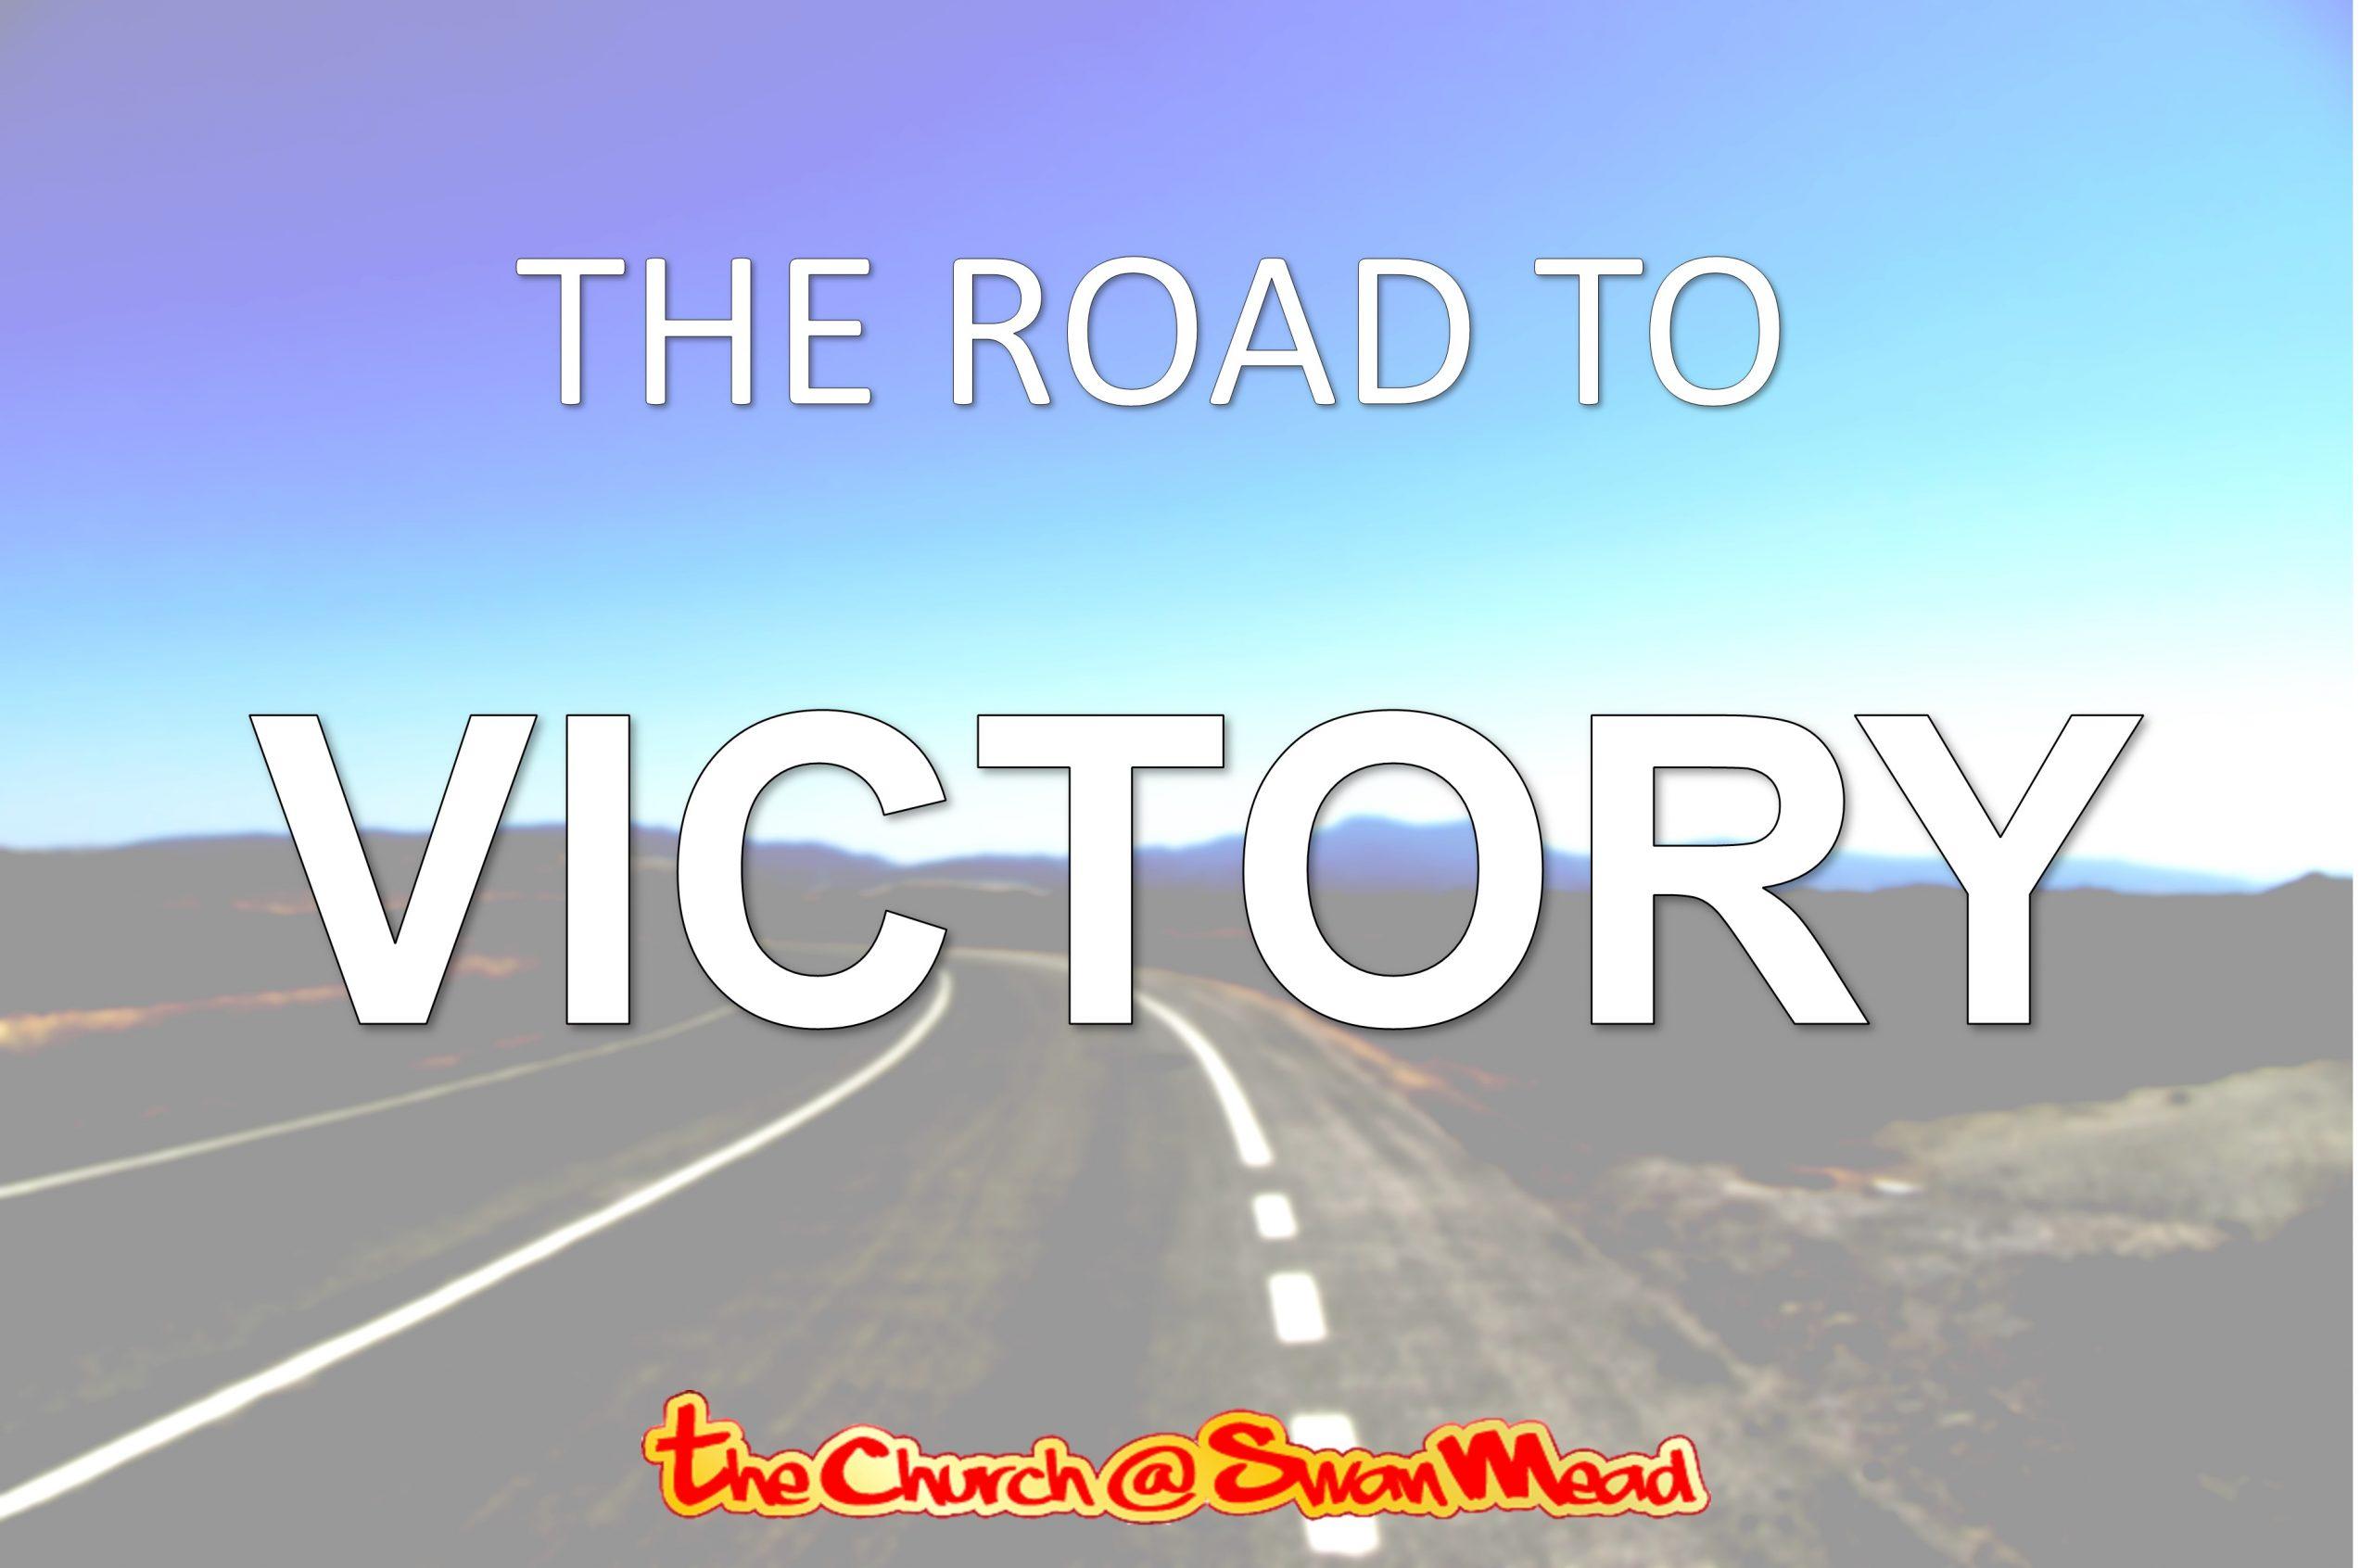 Church at Swanmead - Sermon - Road to Victory